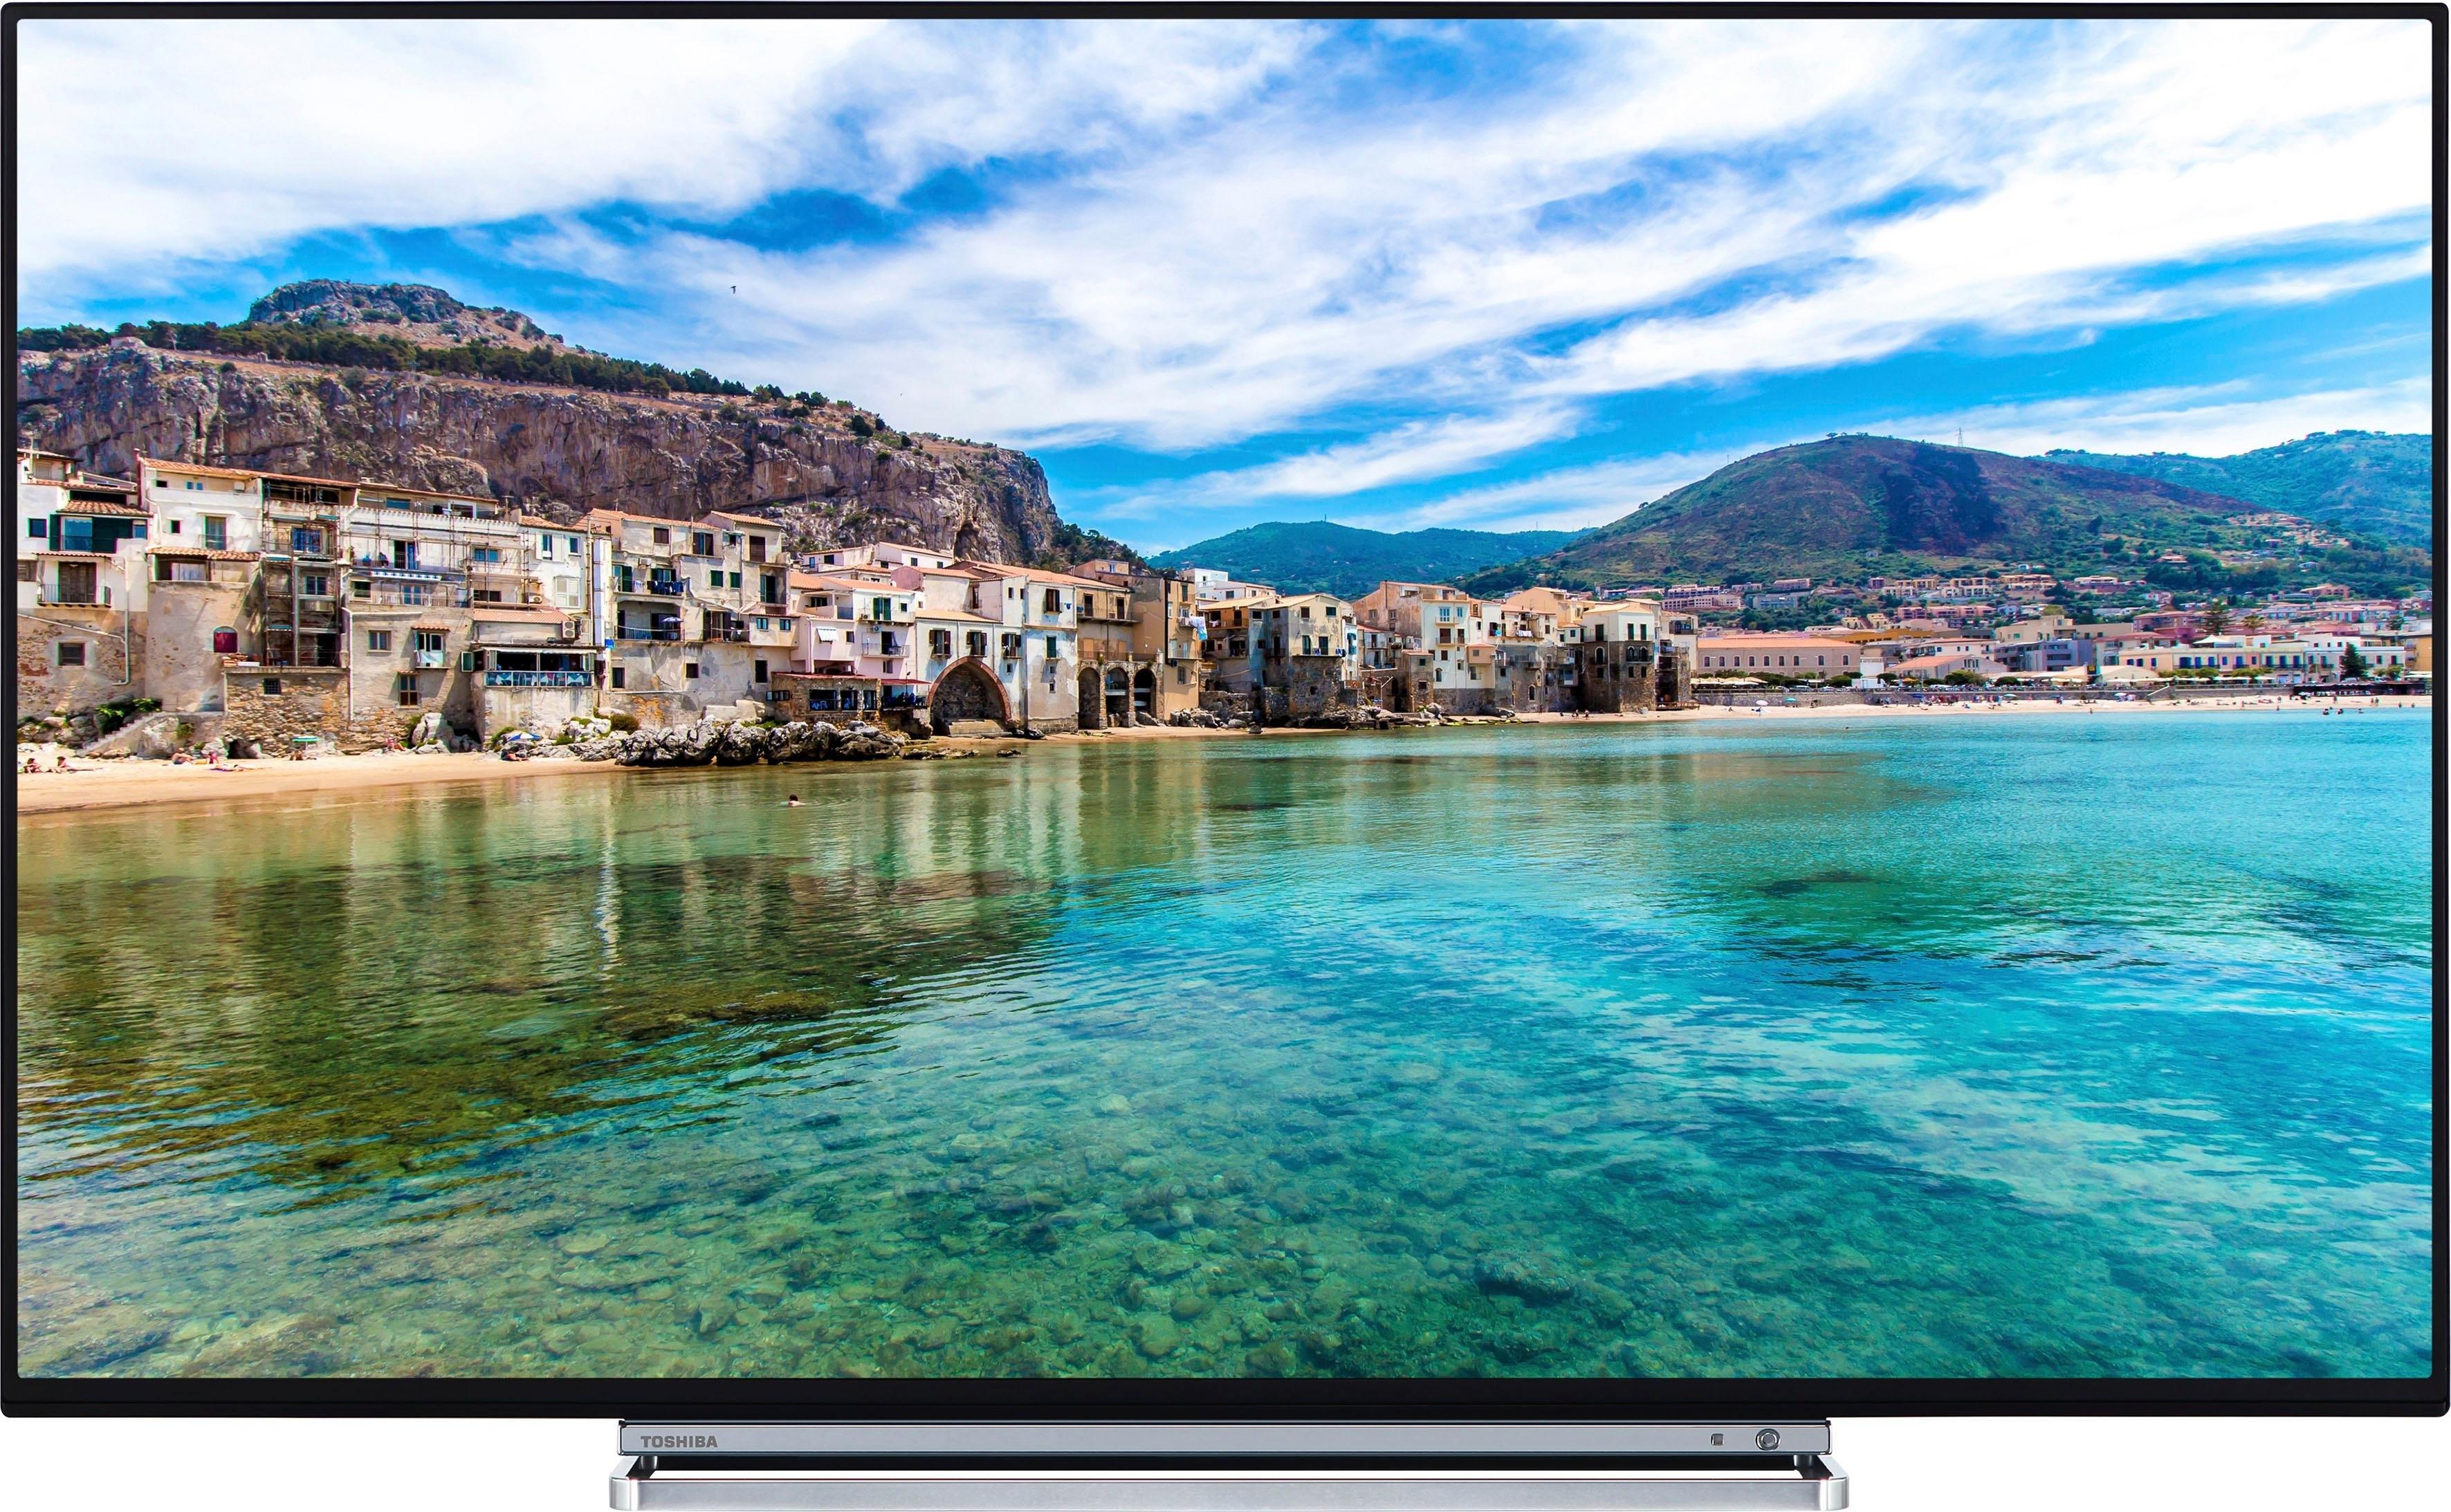 Toshiba 49U5863DA led-tv (124 cm (49 inch)), 4K Ultra HD, smart-tv bij OTTO online kopen